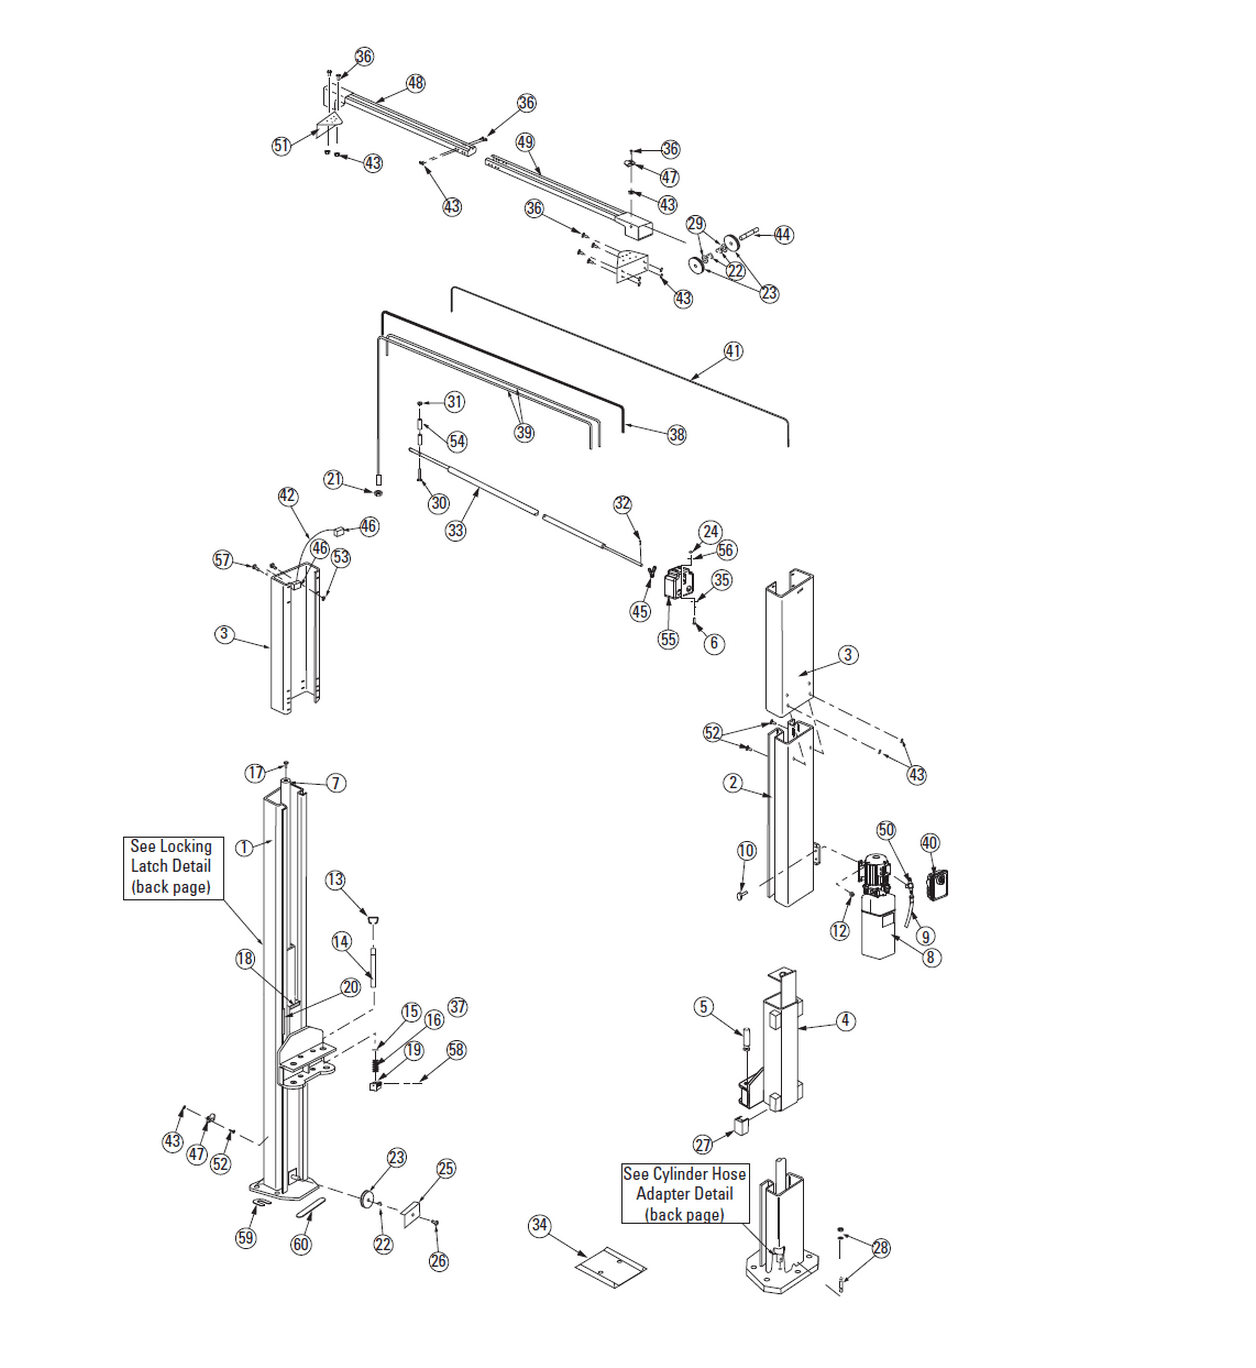 Rotary Spoa10 500 Parts Diagram